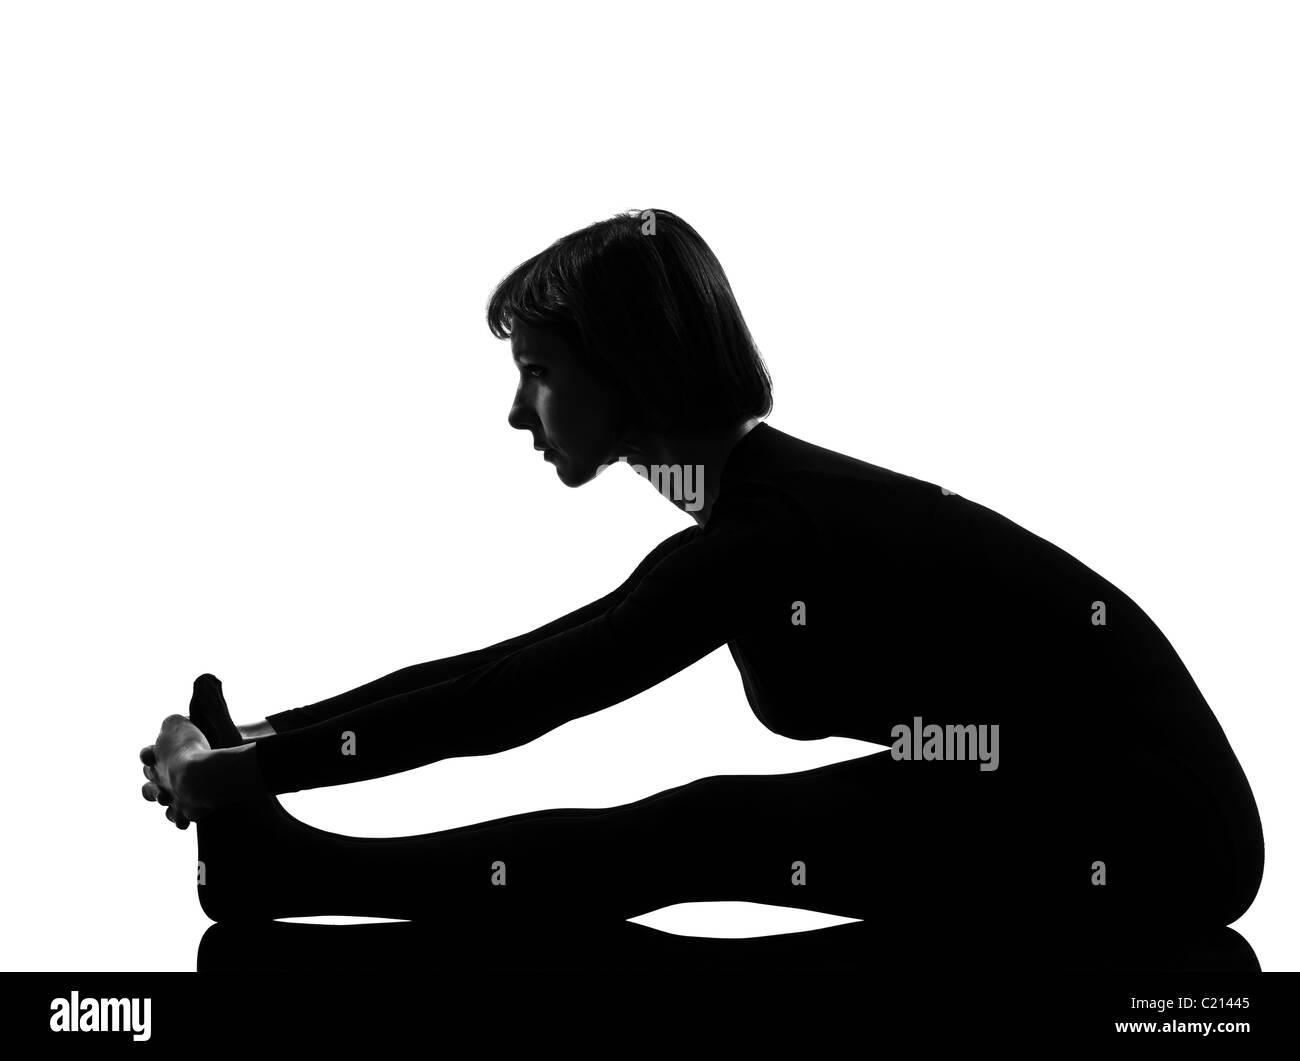 woman paschimottanasana yoga pose posture position in silouhette on studio white background full length - Stock Image